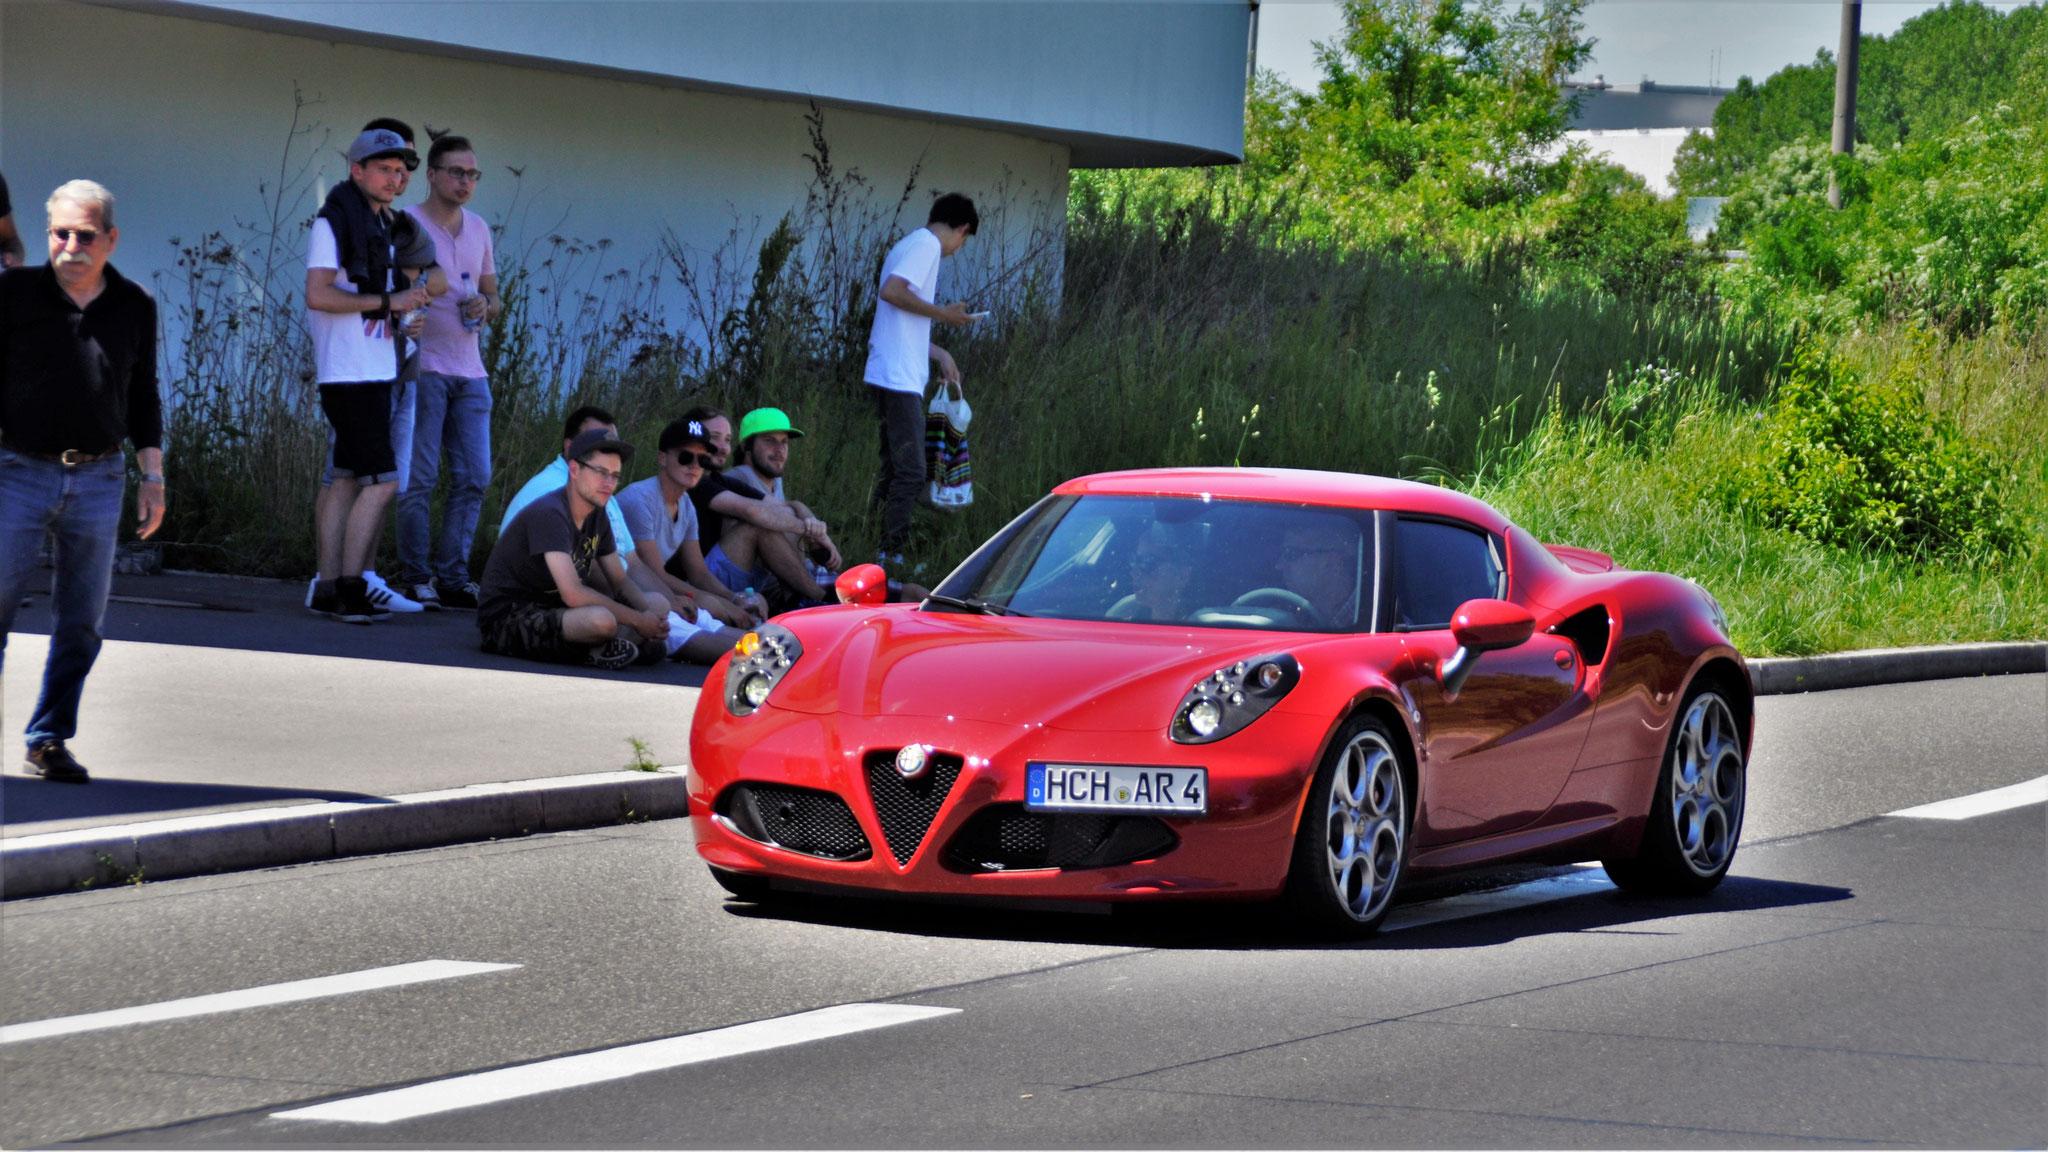 Alfa Romeo 4C - HCH-AR-4